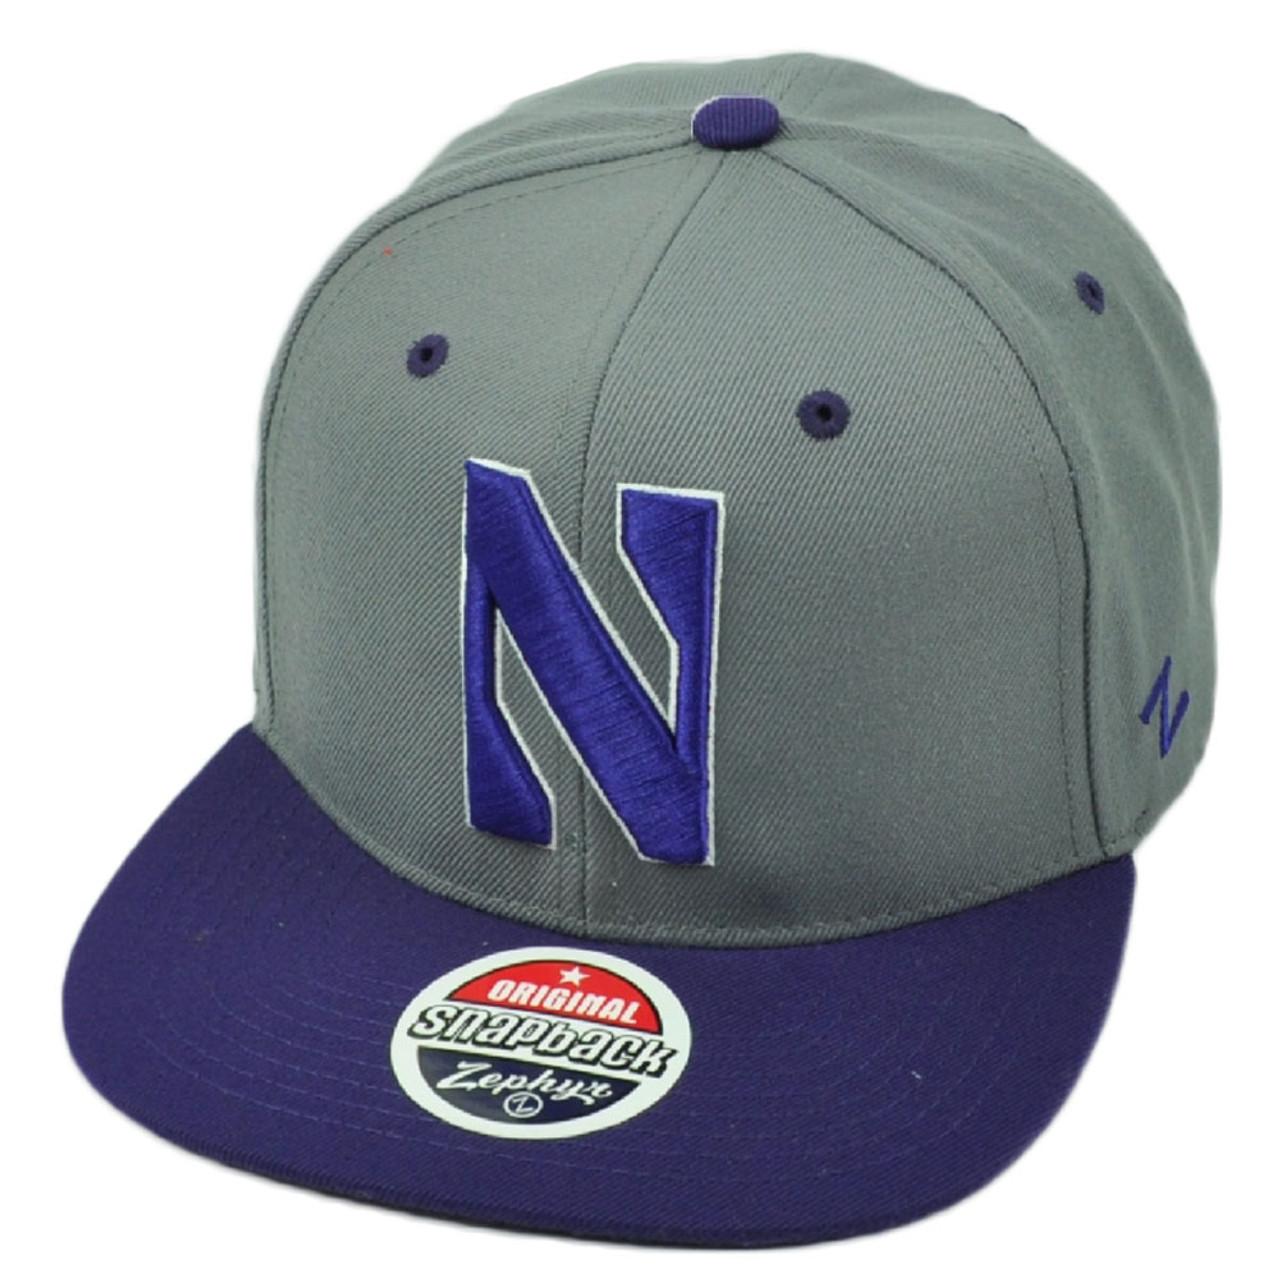 Street Sign NCAA Licensed Northwestern Wildcats Rd Patio, Lawn & Garden Fan Shop